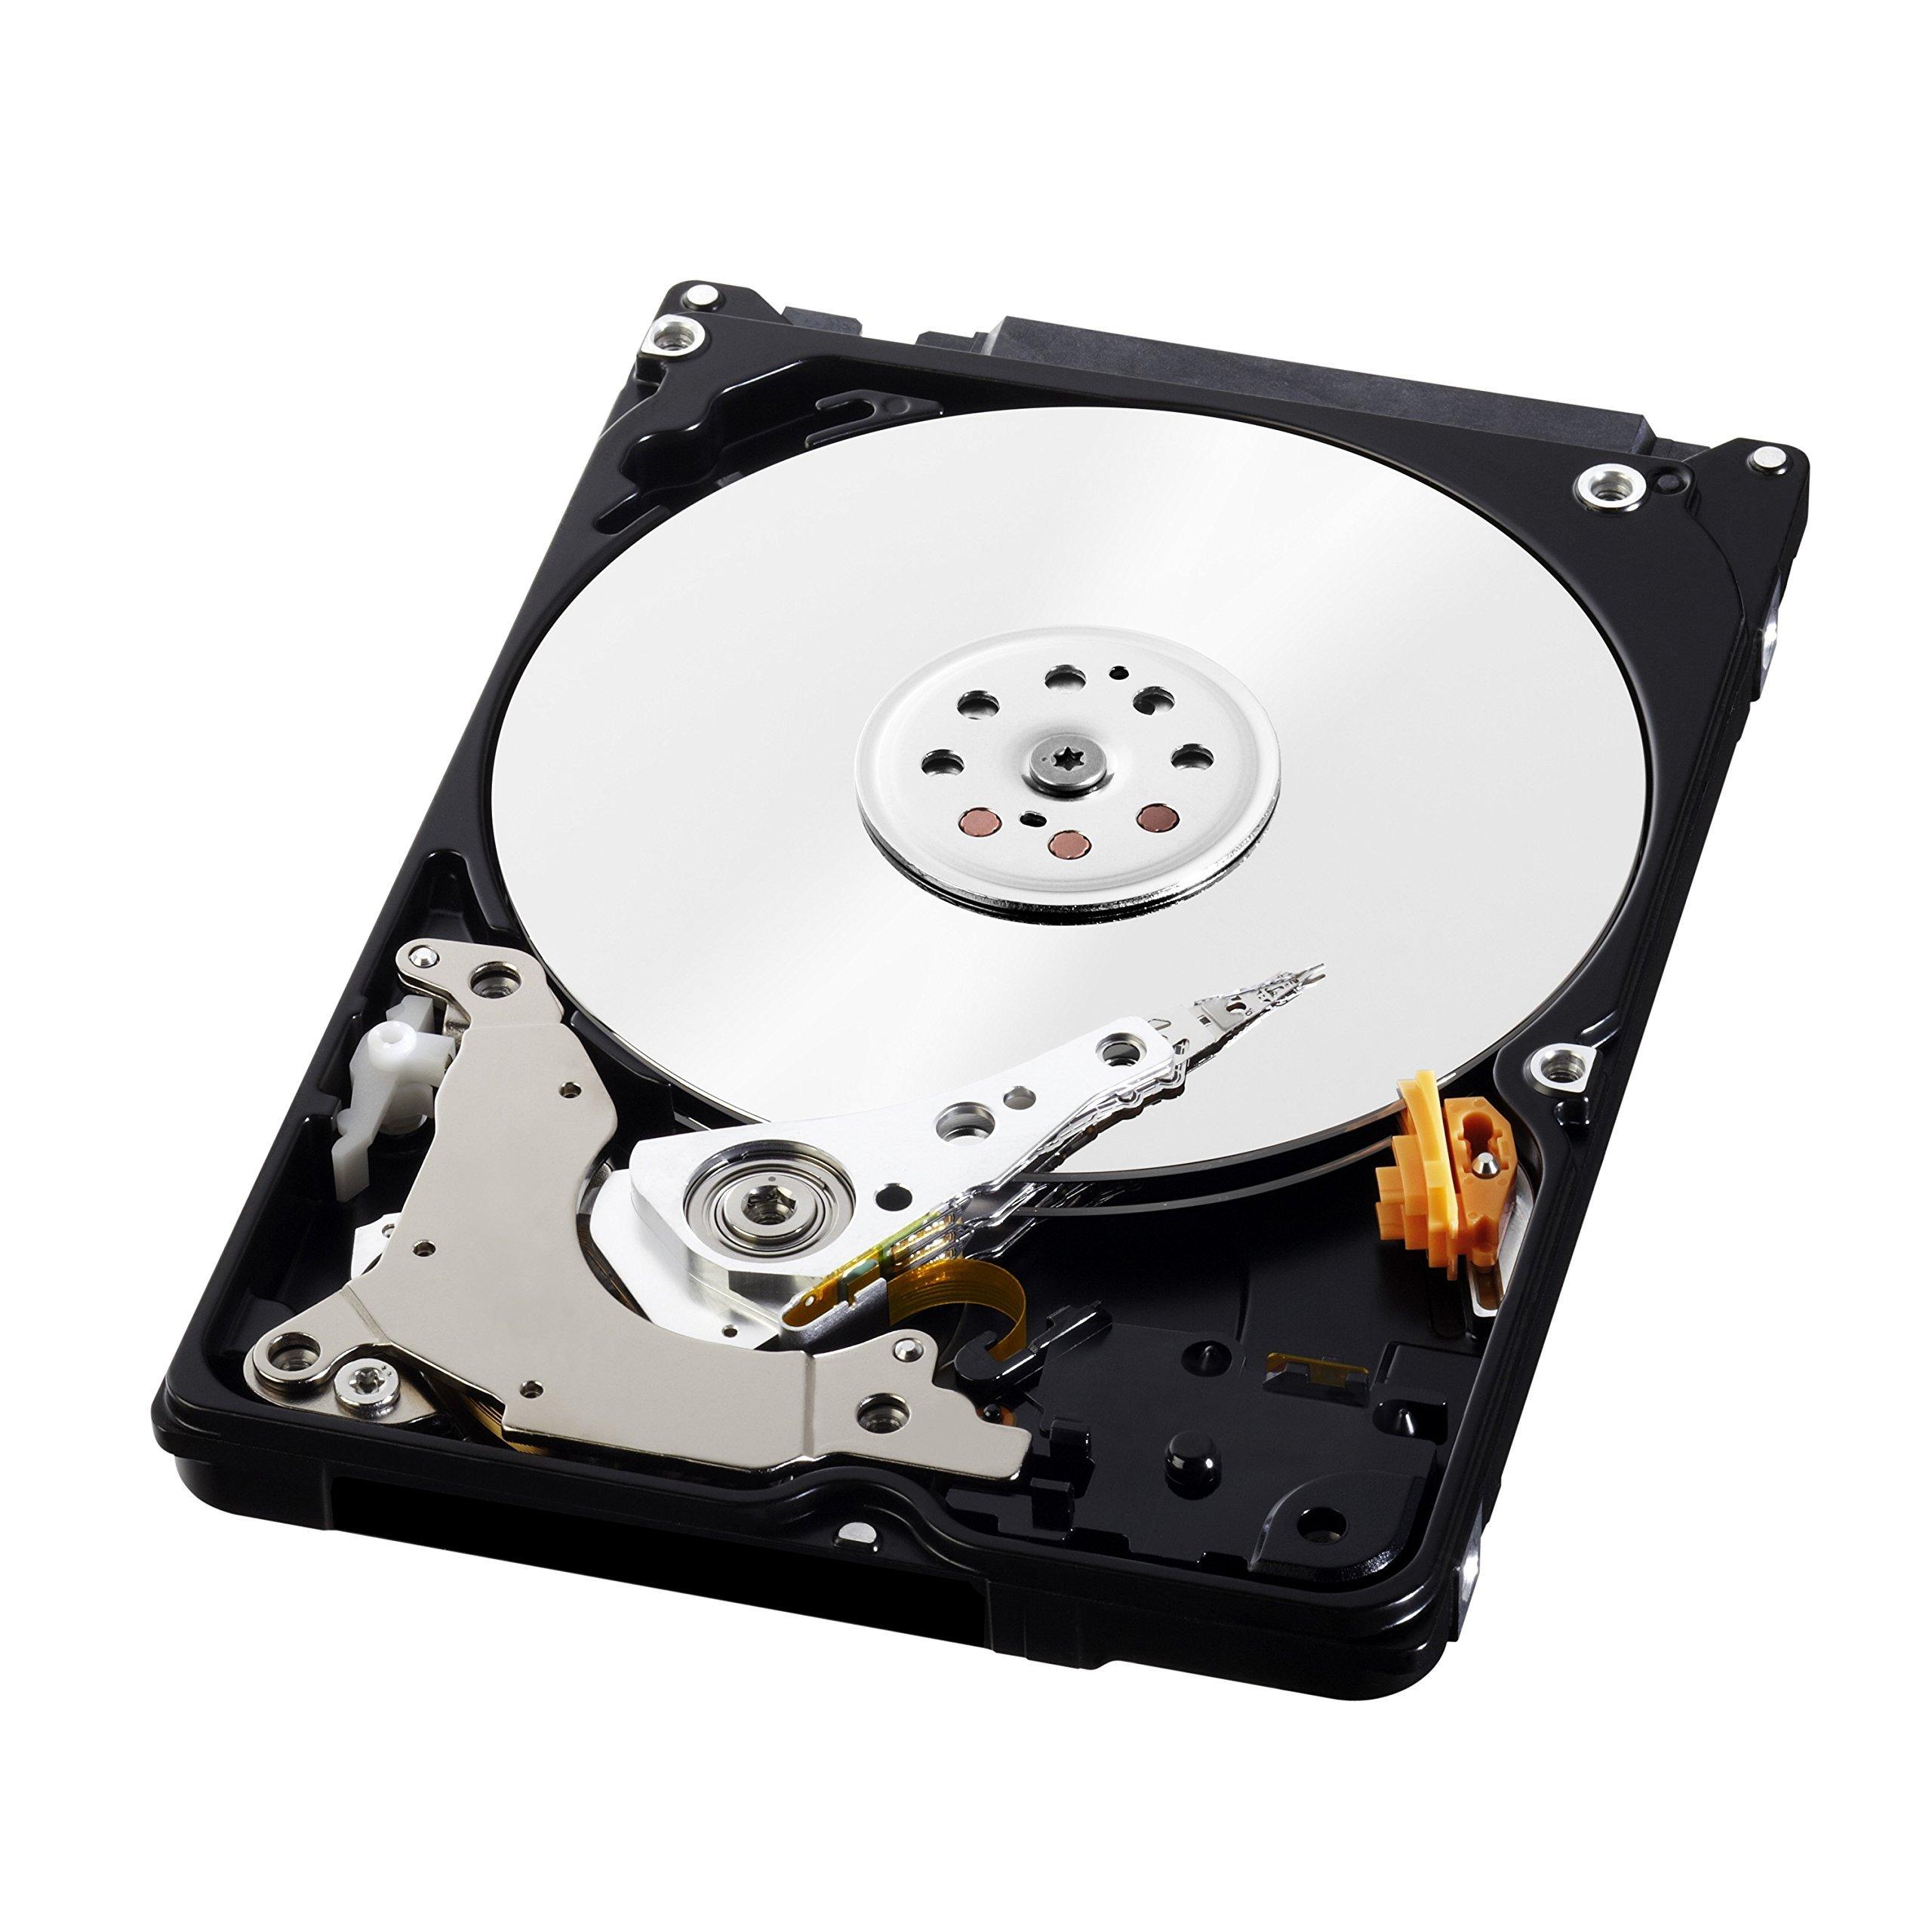 WD Blue 1TB Mobile Hard Disk Drive - 5400 RPM SATA 6 Gb/s 9.5 MM 2.5 Inch - WD10JPVX (Certified Refurbished)